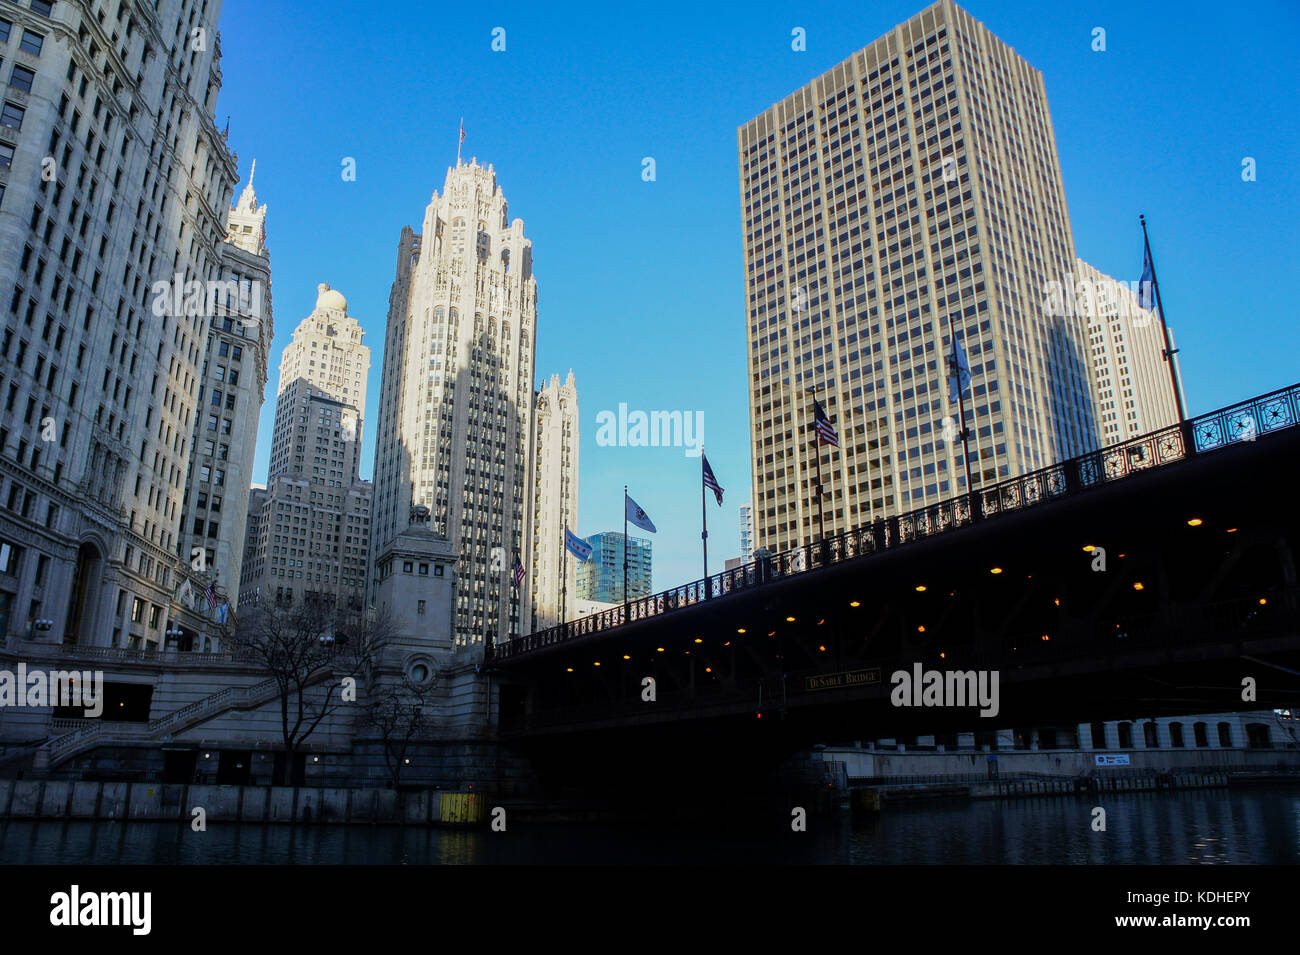 The historical Tribune Tower at Chicago, Illinois, United States - Stock Image